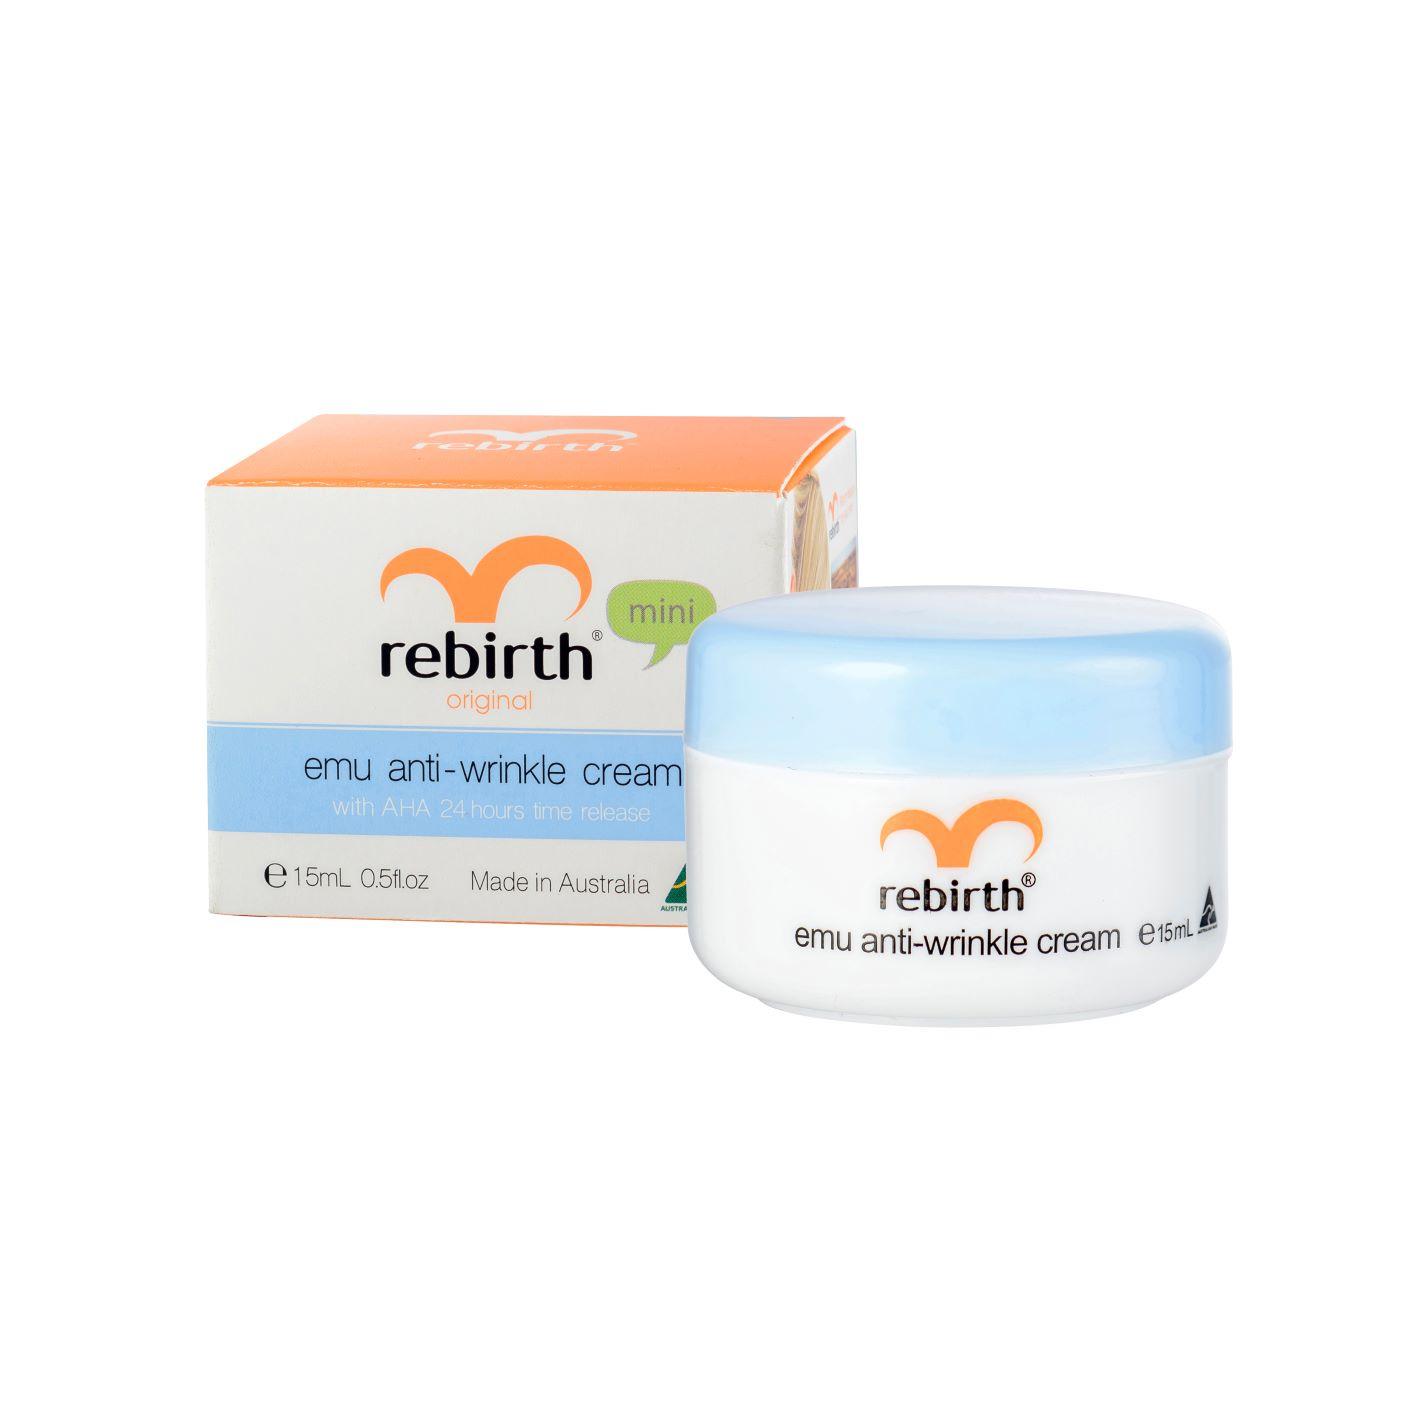 RebirthКрем от морщин с маслом эму и фруктовыми кислотами Emu Anti-wrinkle Cream  15ml Rebirth